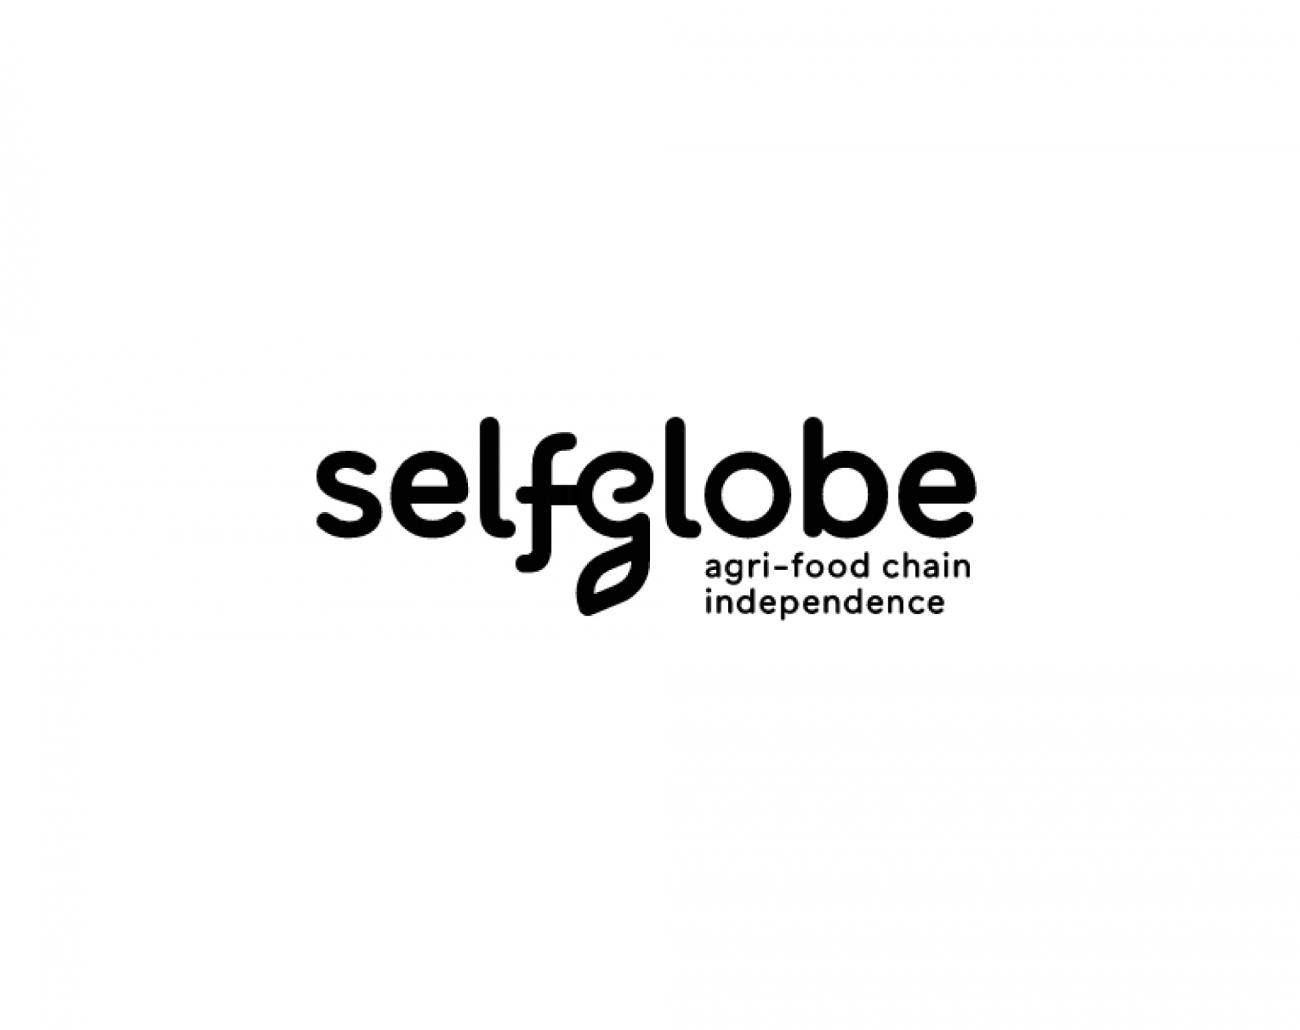 selfglobe_logo